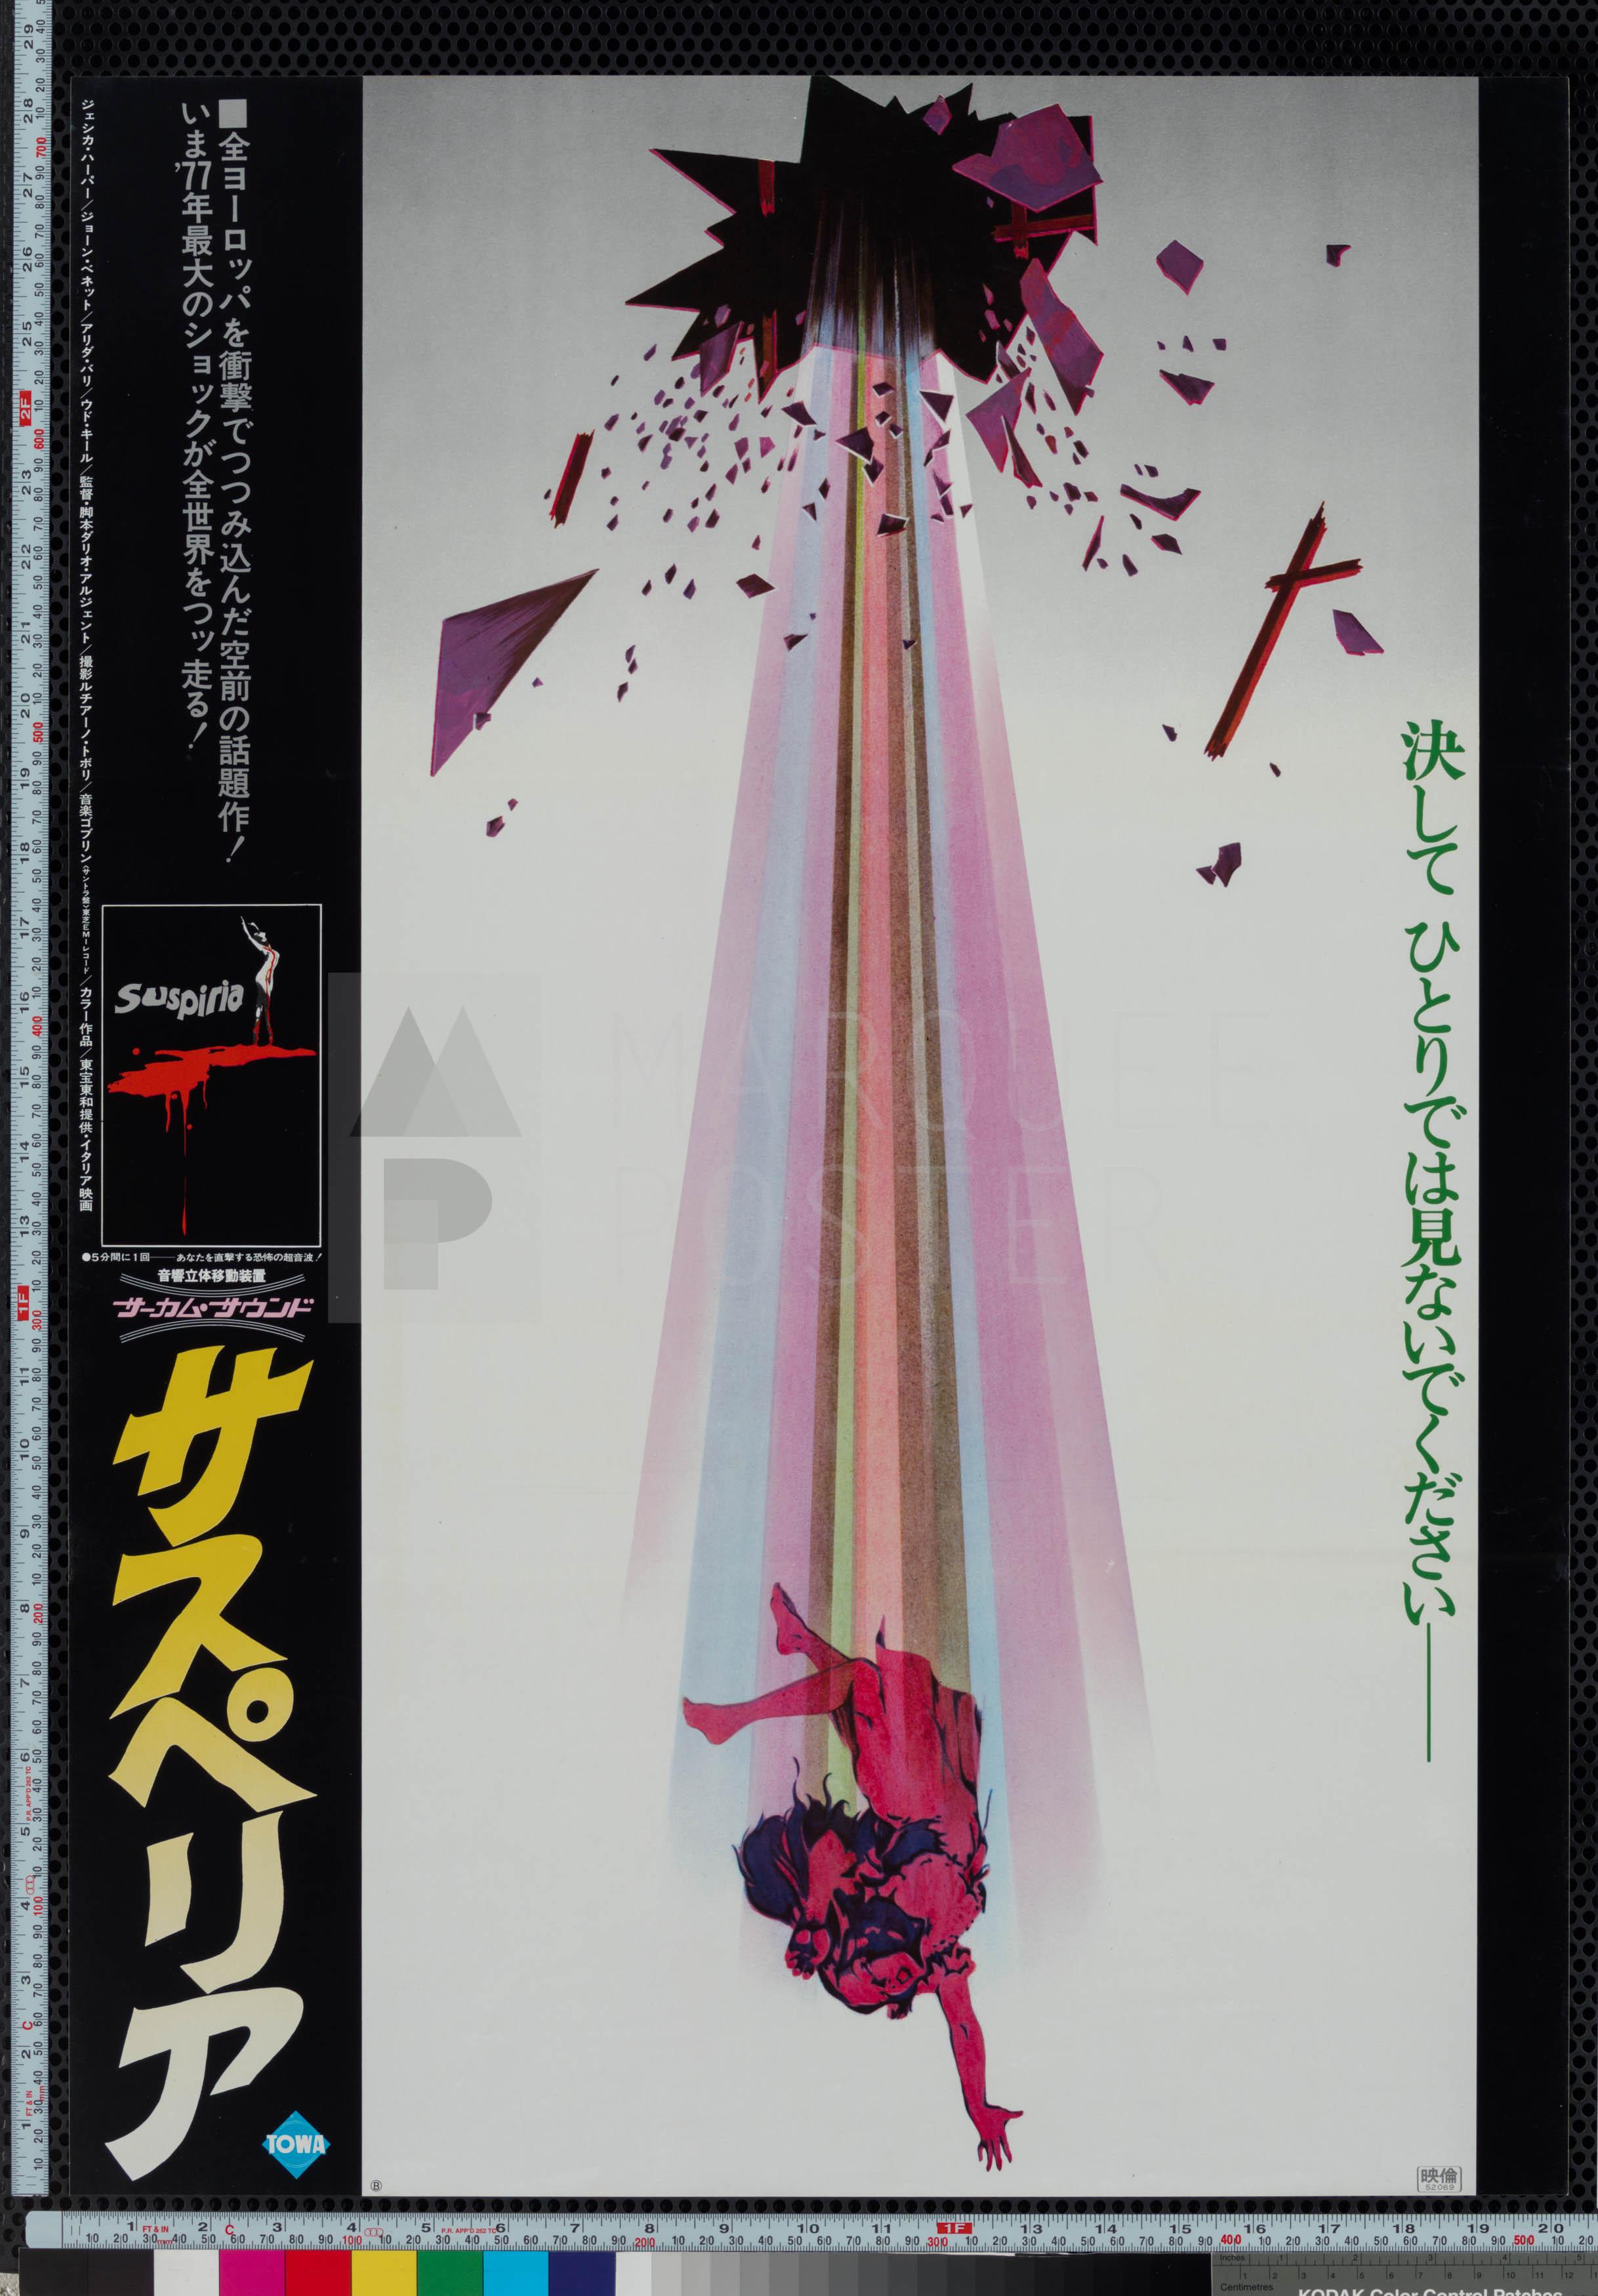 33-suspiria-falling-style-japanese-b2-1977-02